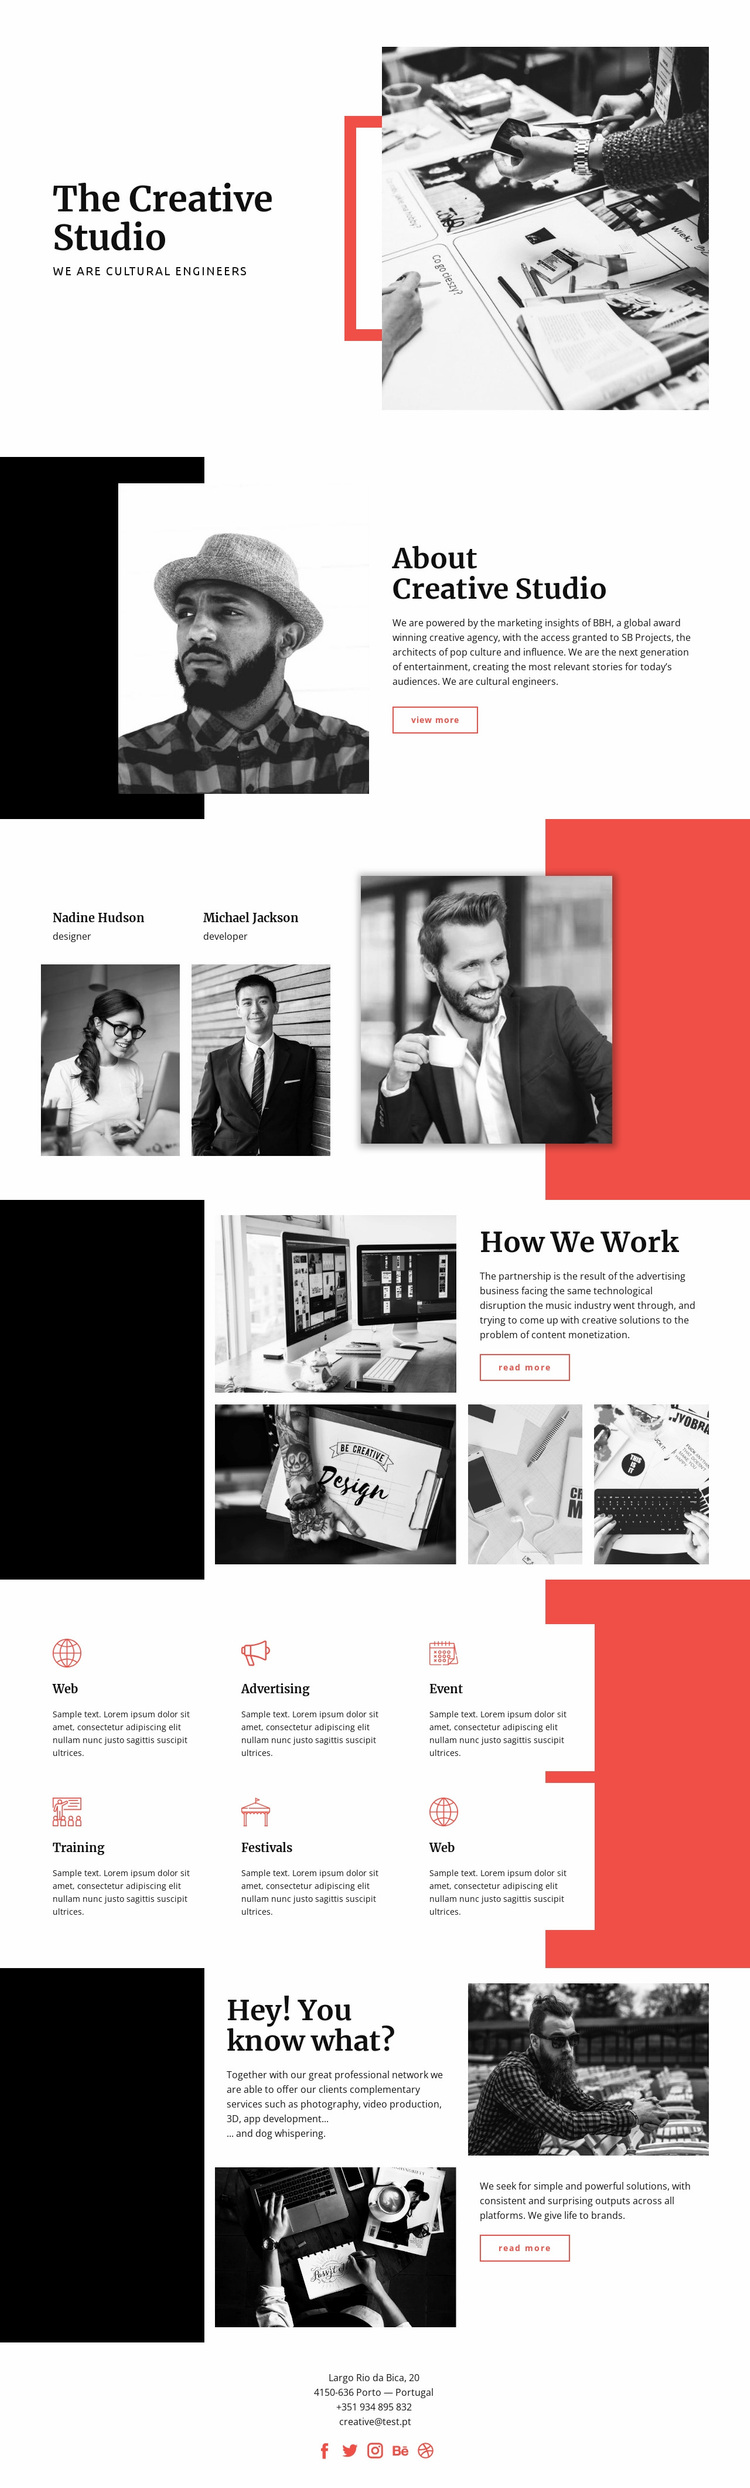 The Creative Studio Website Design